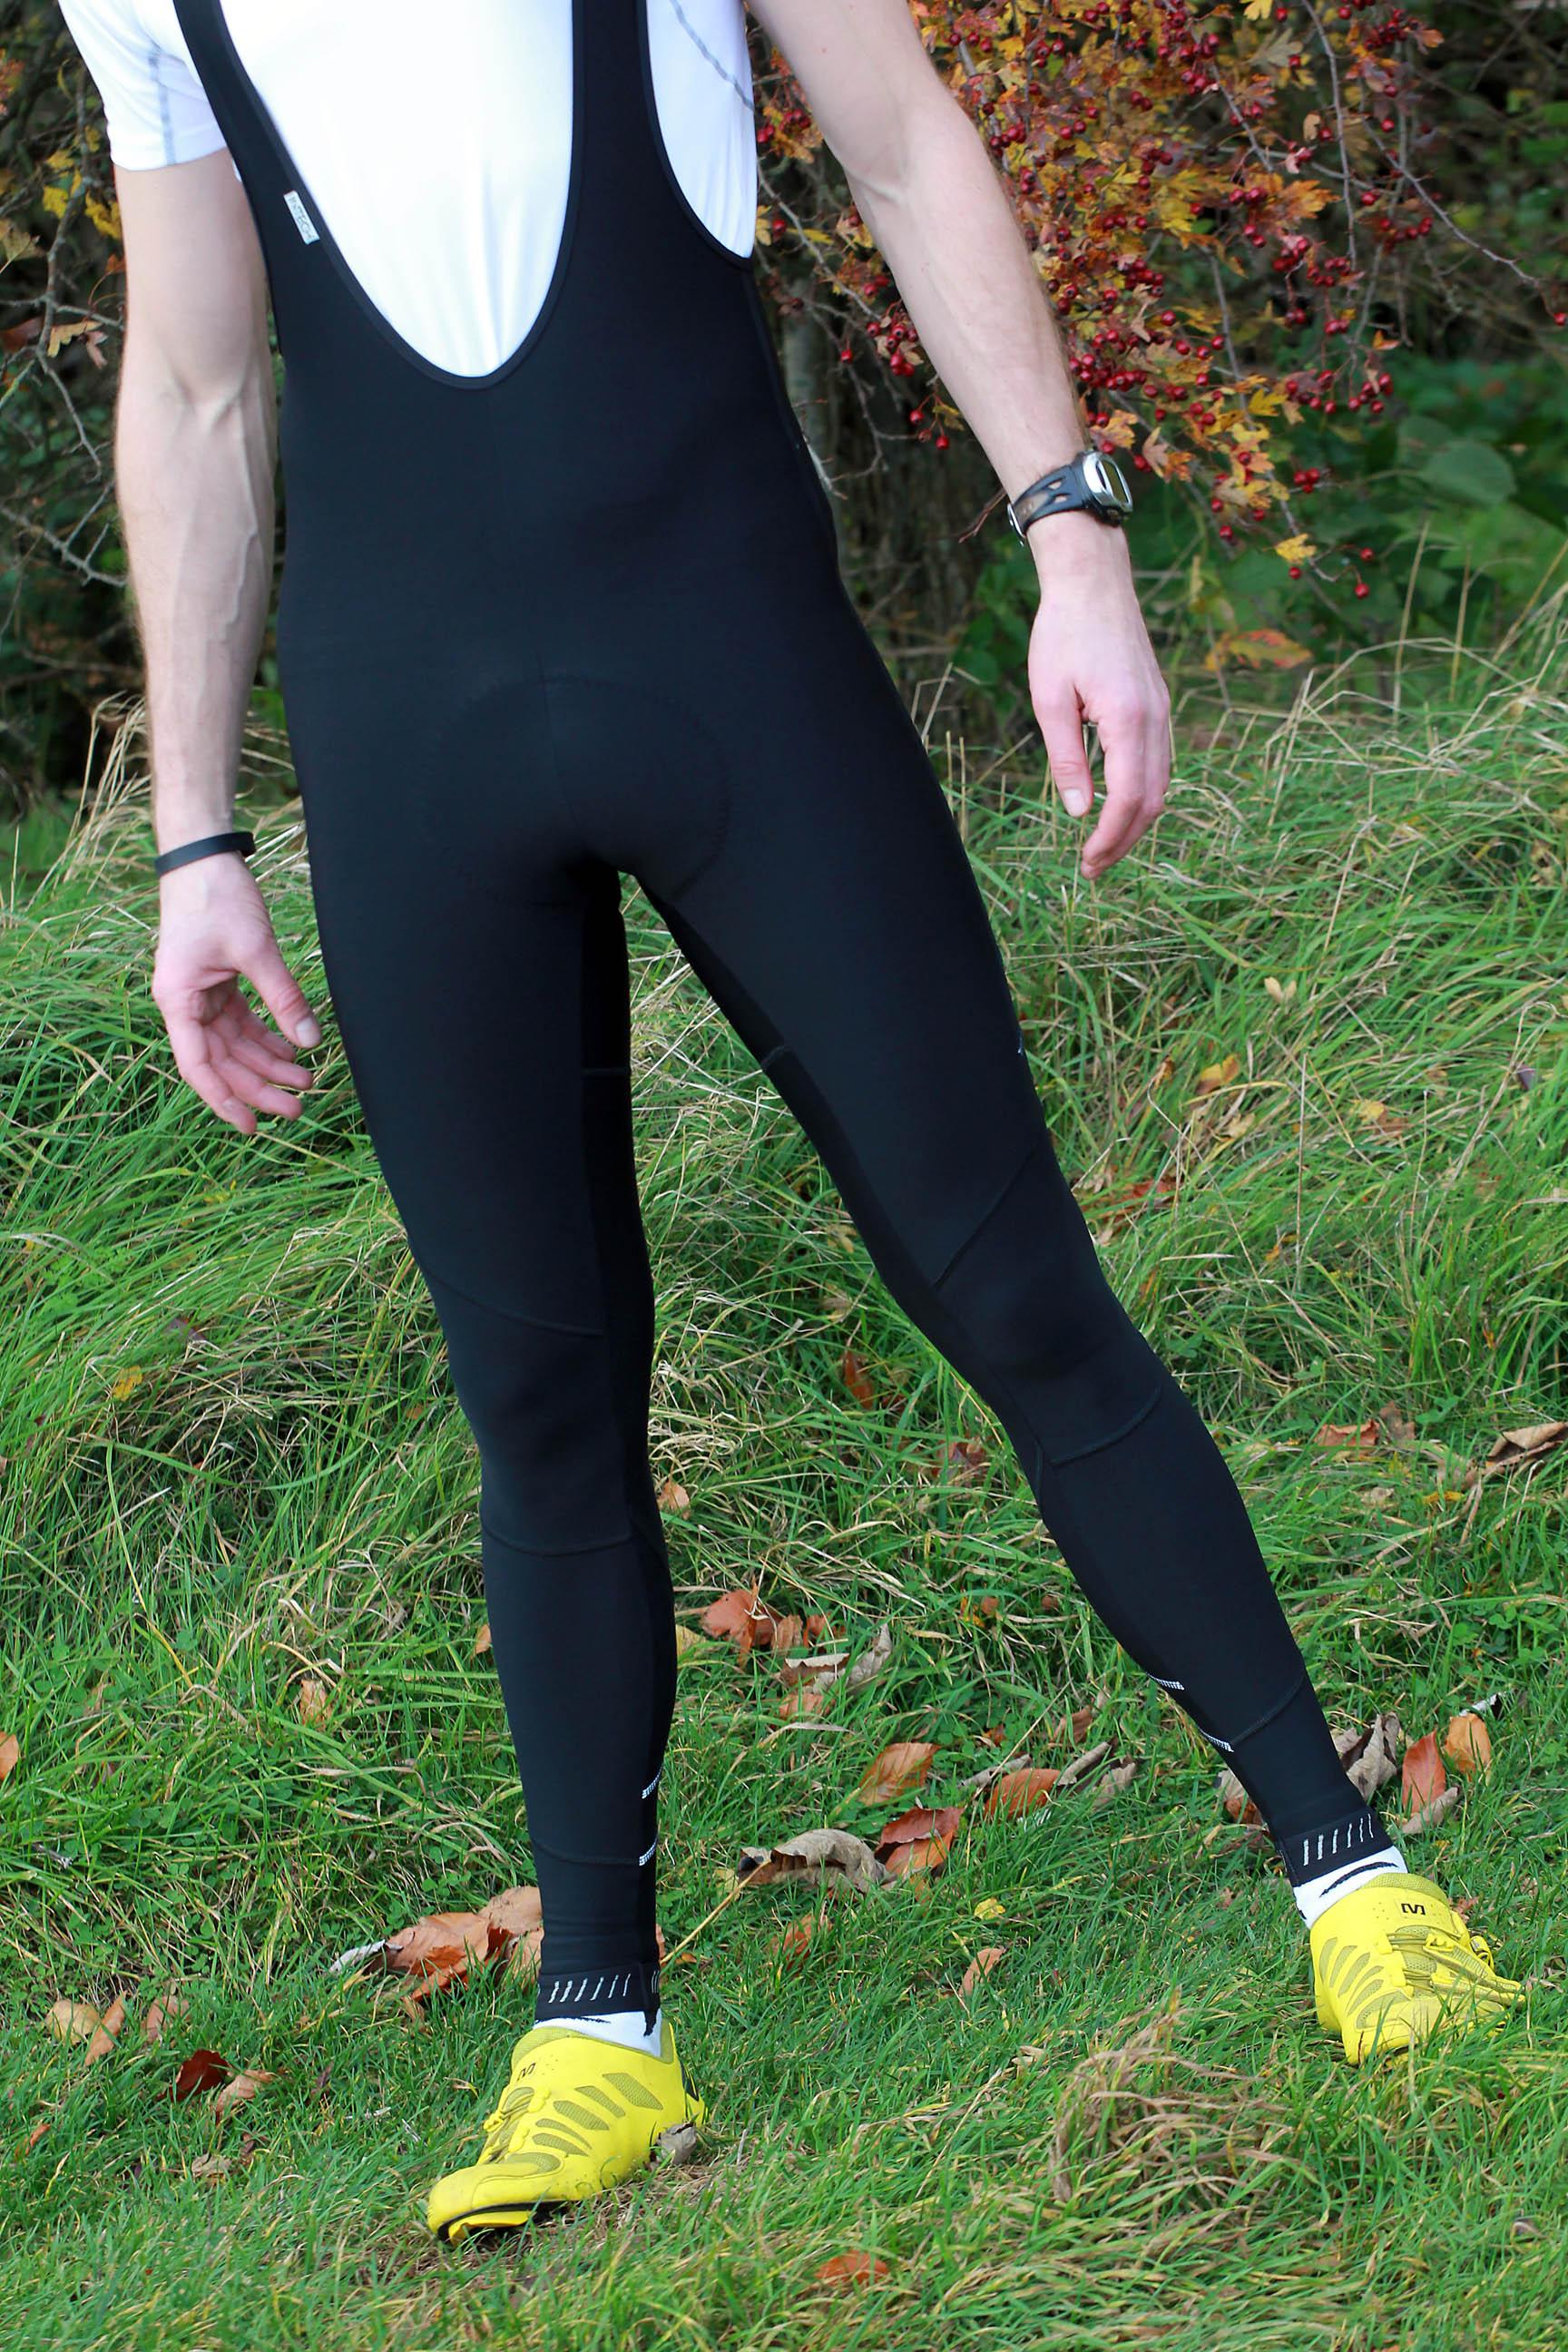 Size M Details about  /Santini Gocce Acqua Zero Cycling Bib Tights with NAT Pad